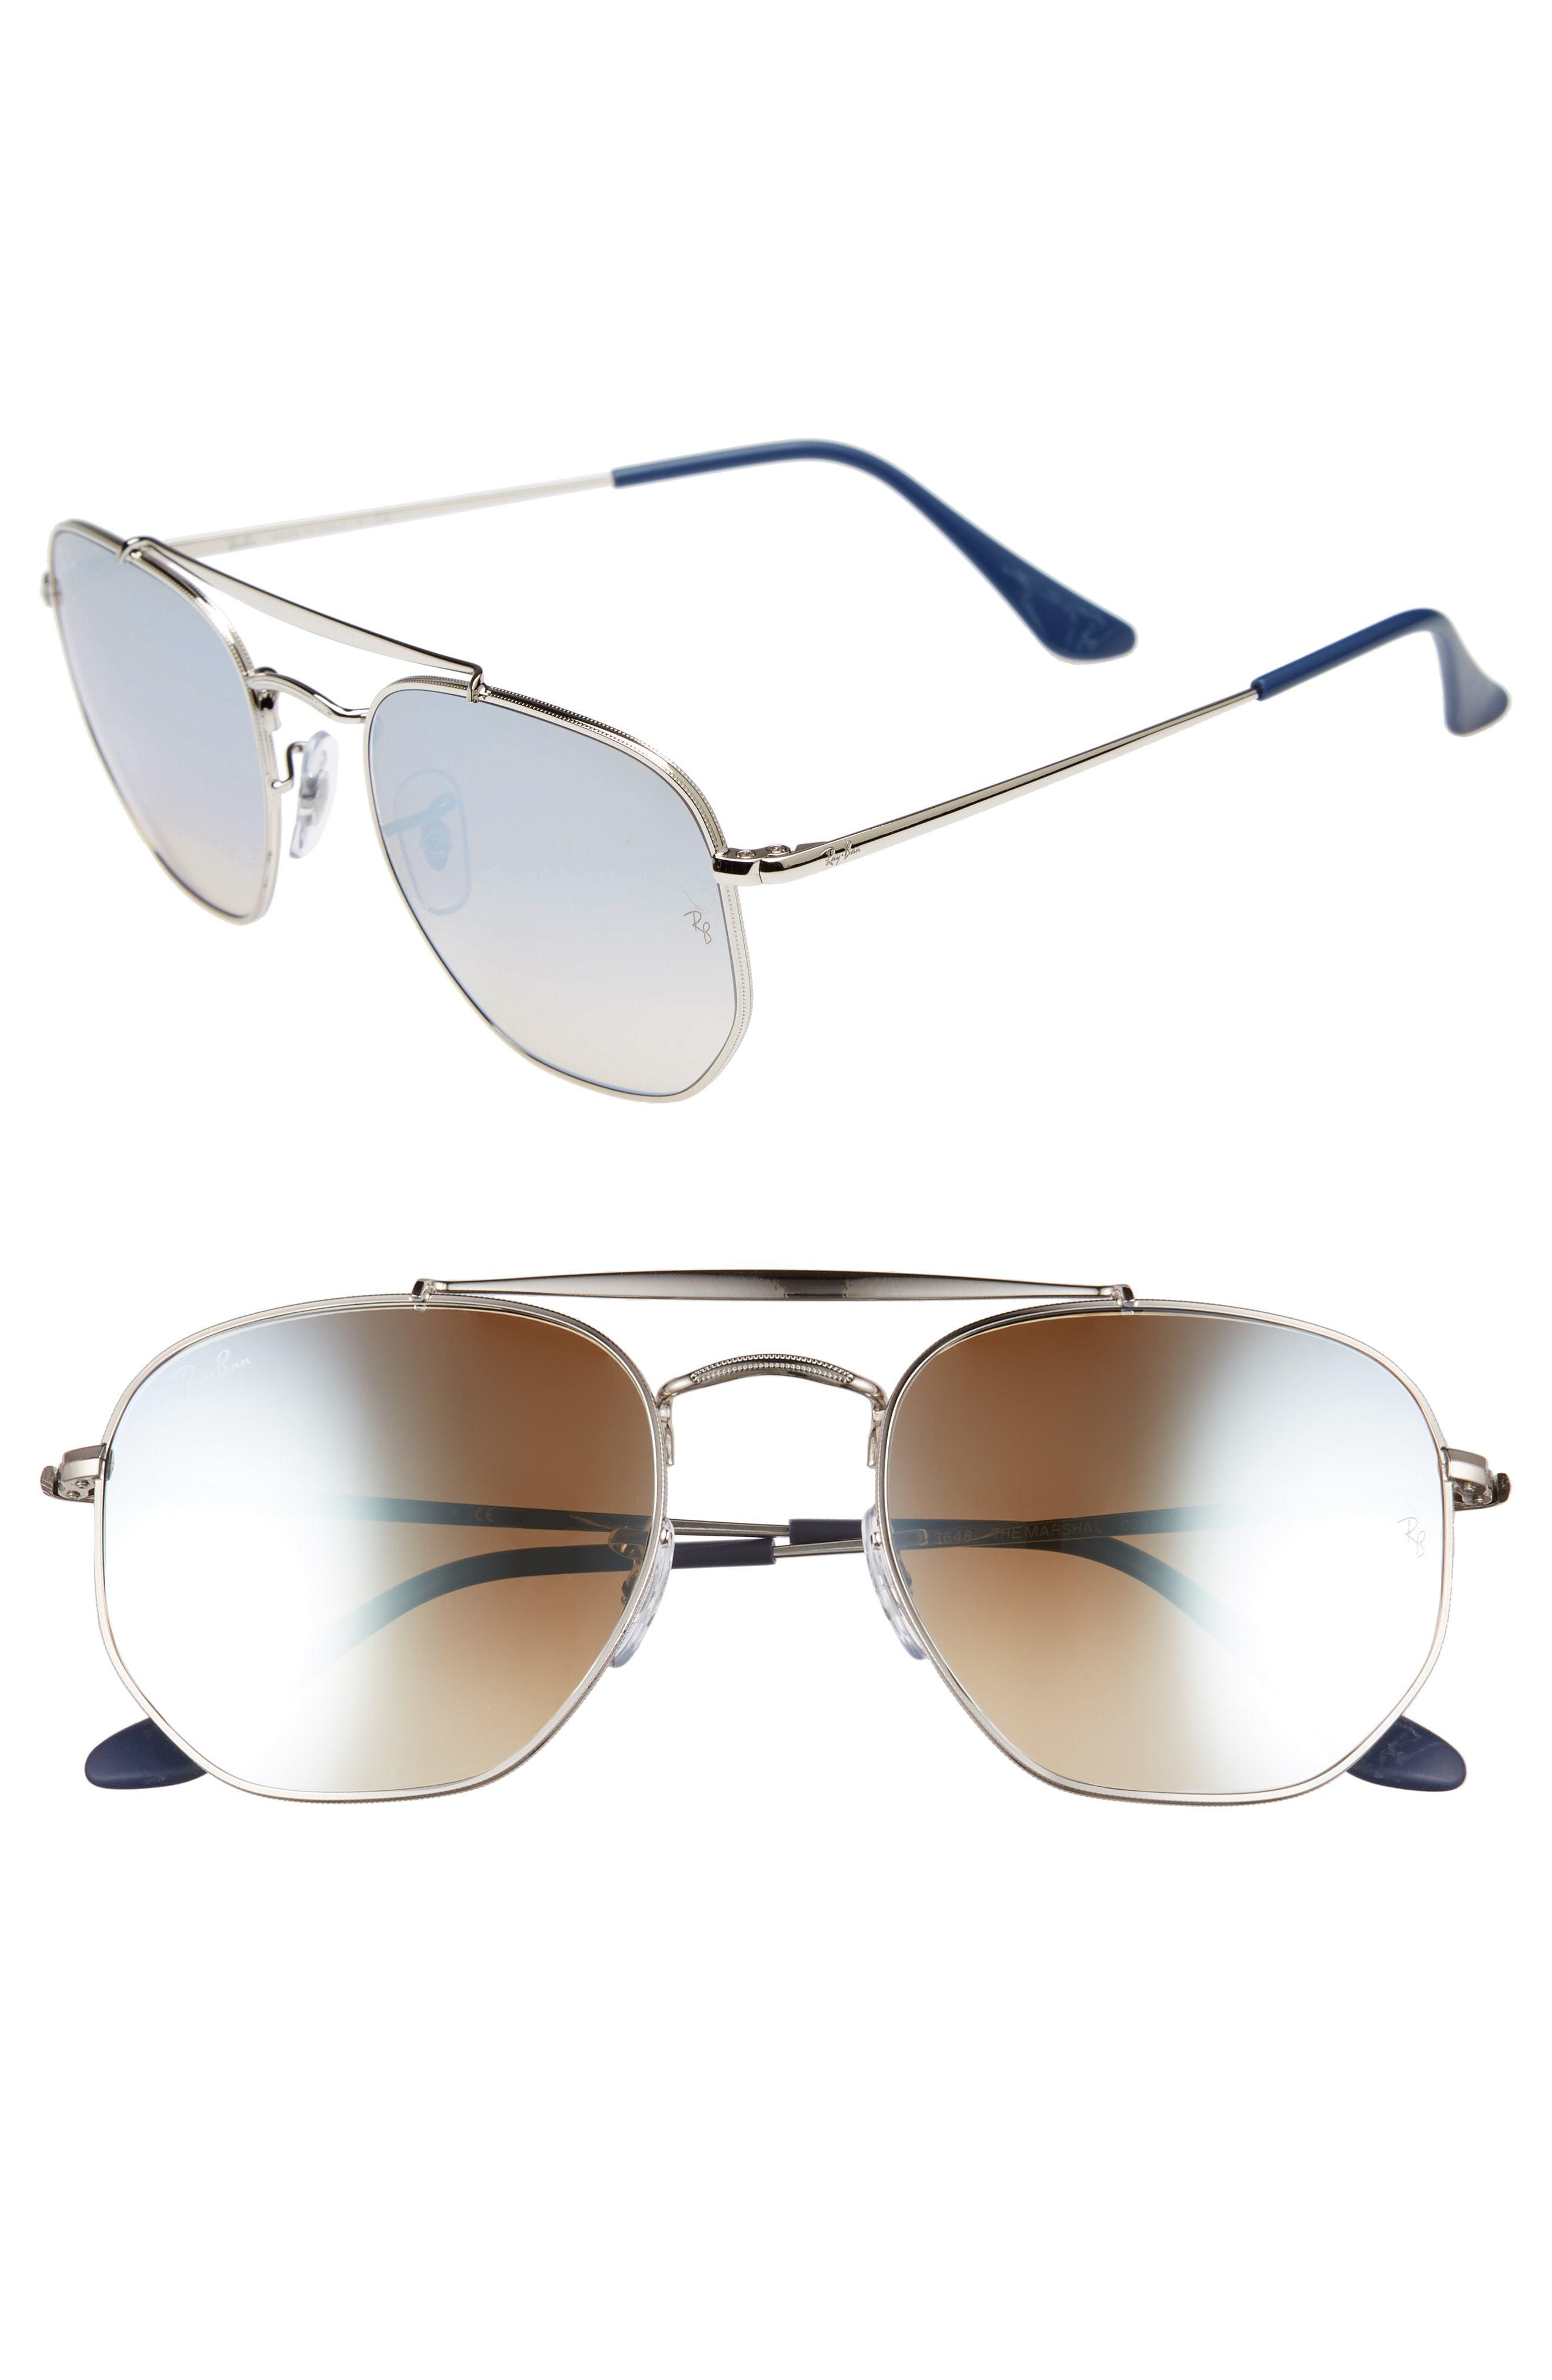 c98e31dca9f2a ... Ray-Ban Marshal 54mm Aviator Sunglasses